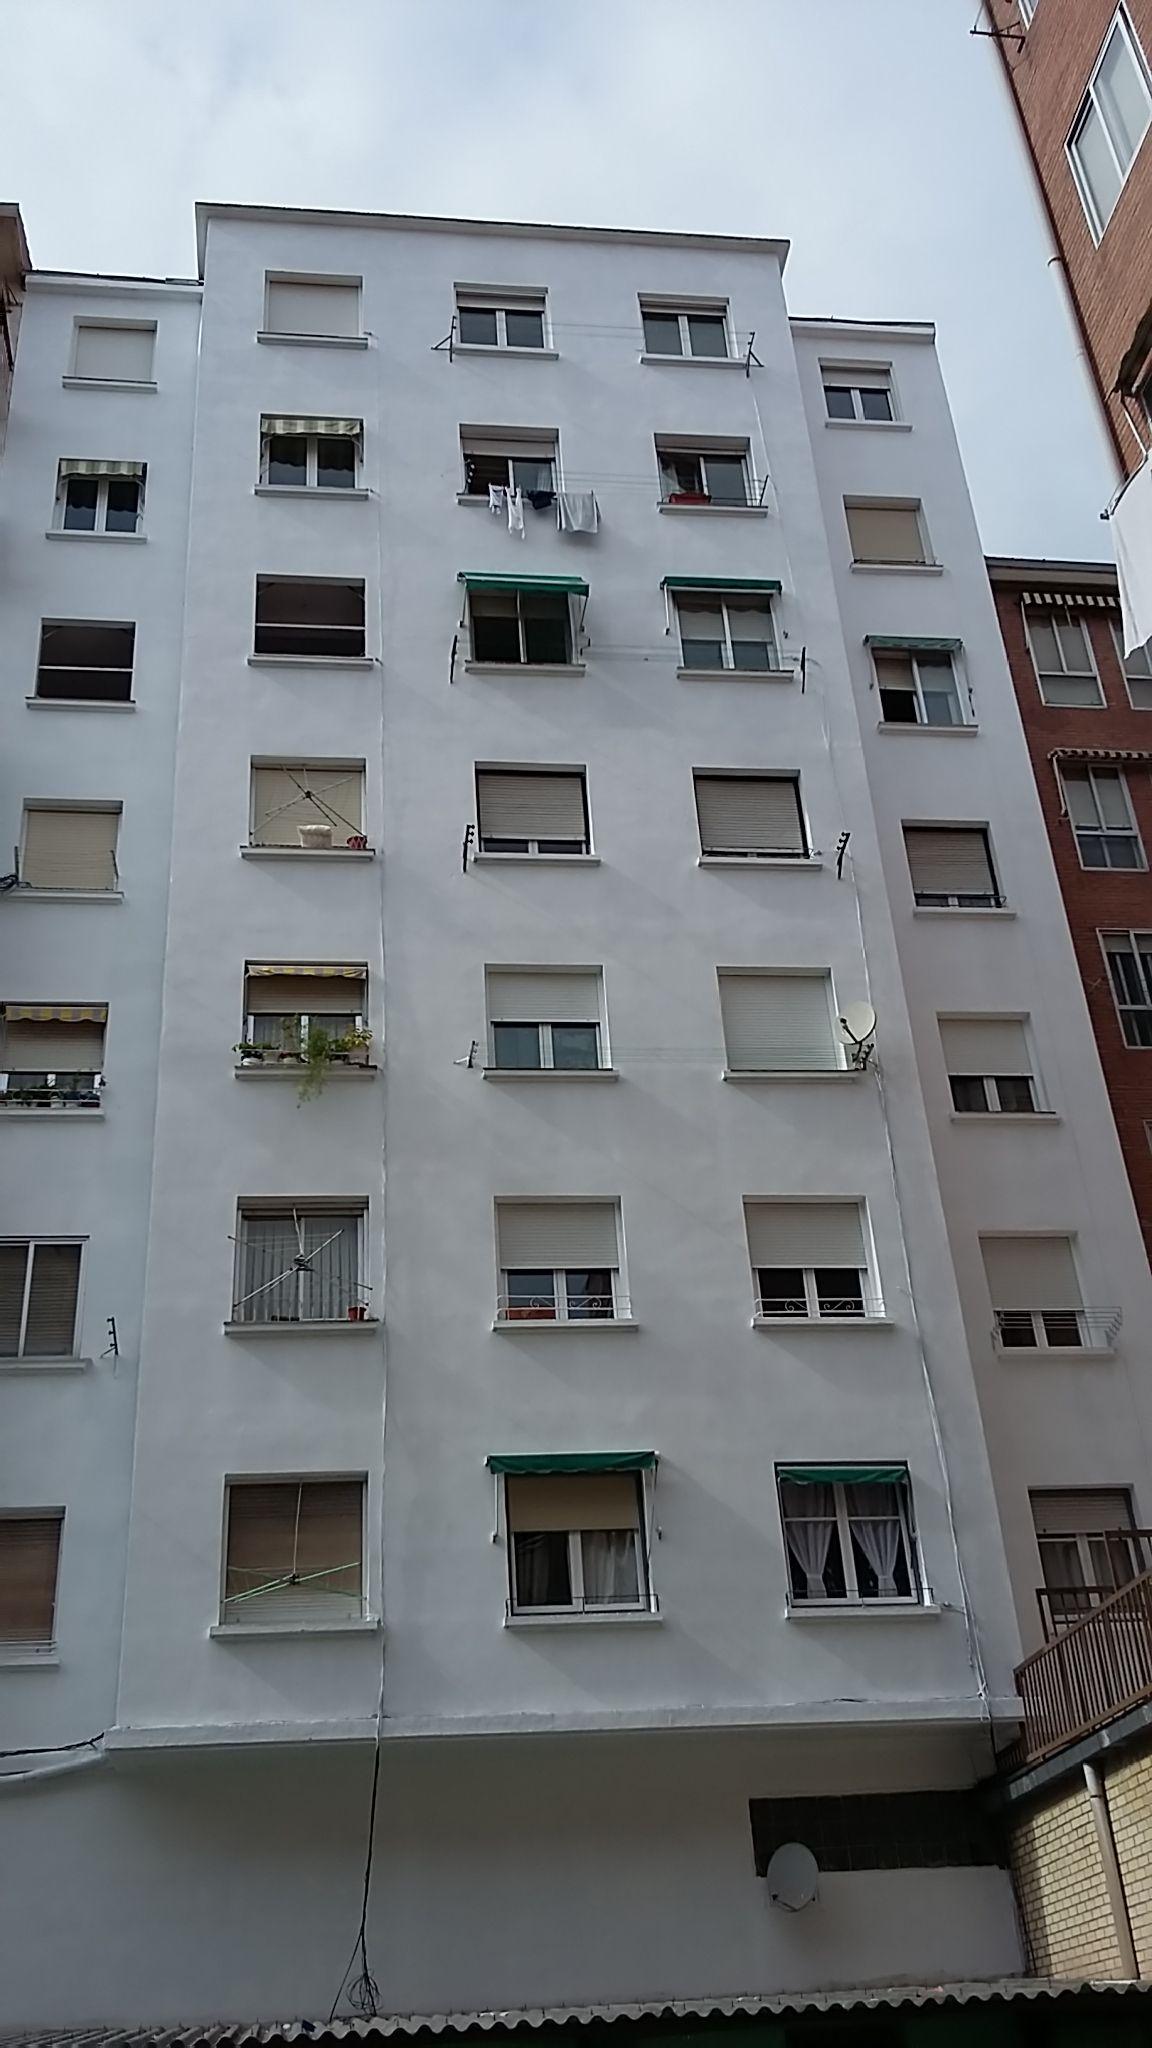 Proceso de restauración de fachada finalizado